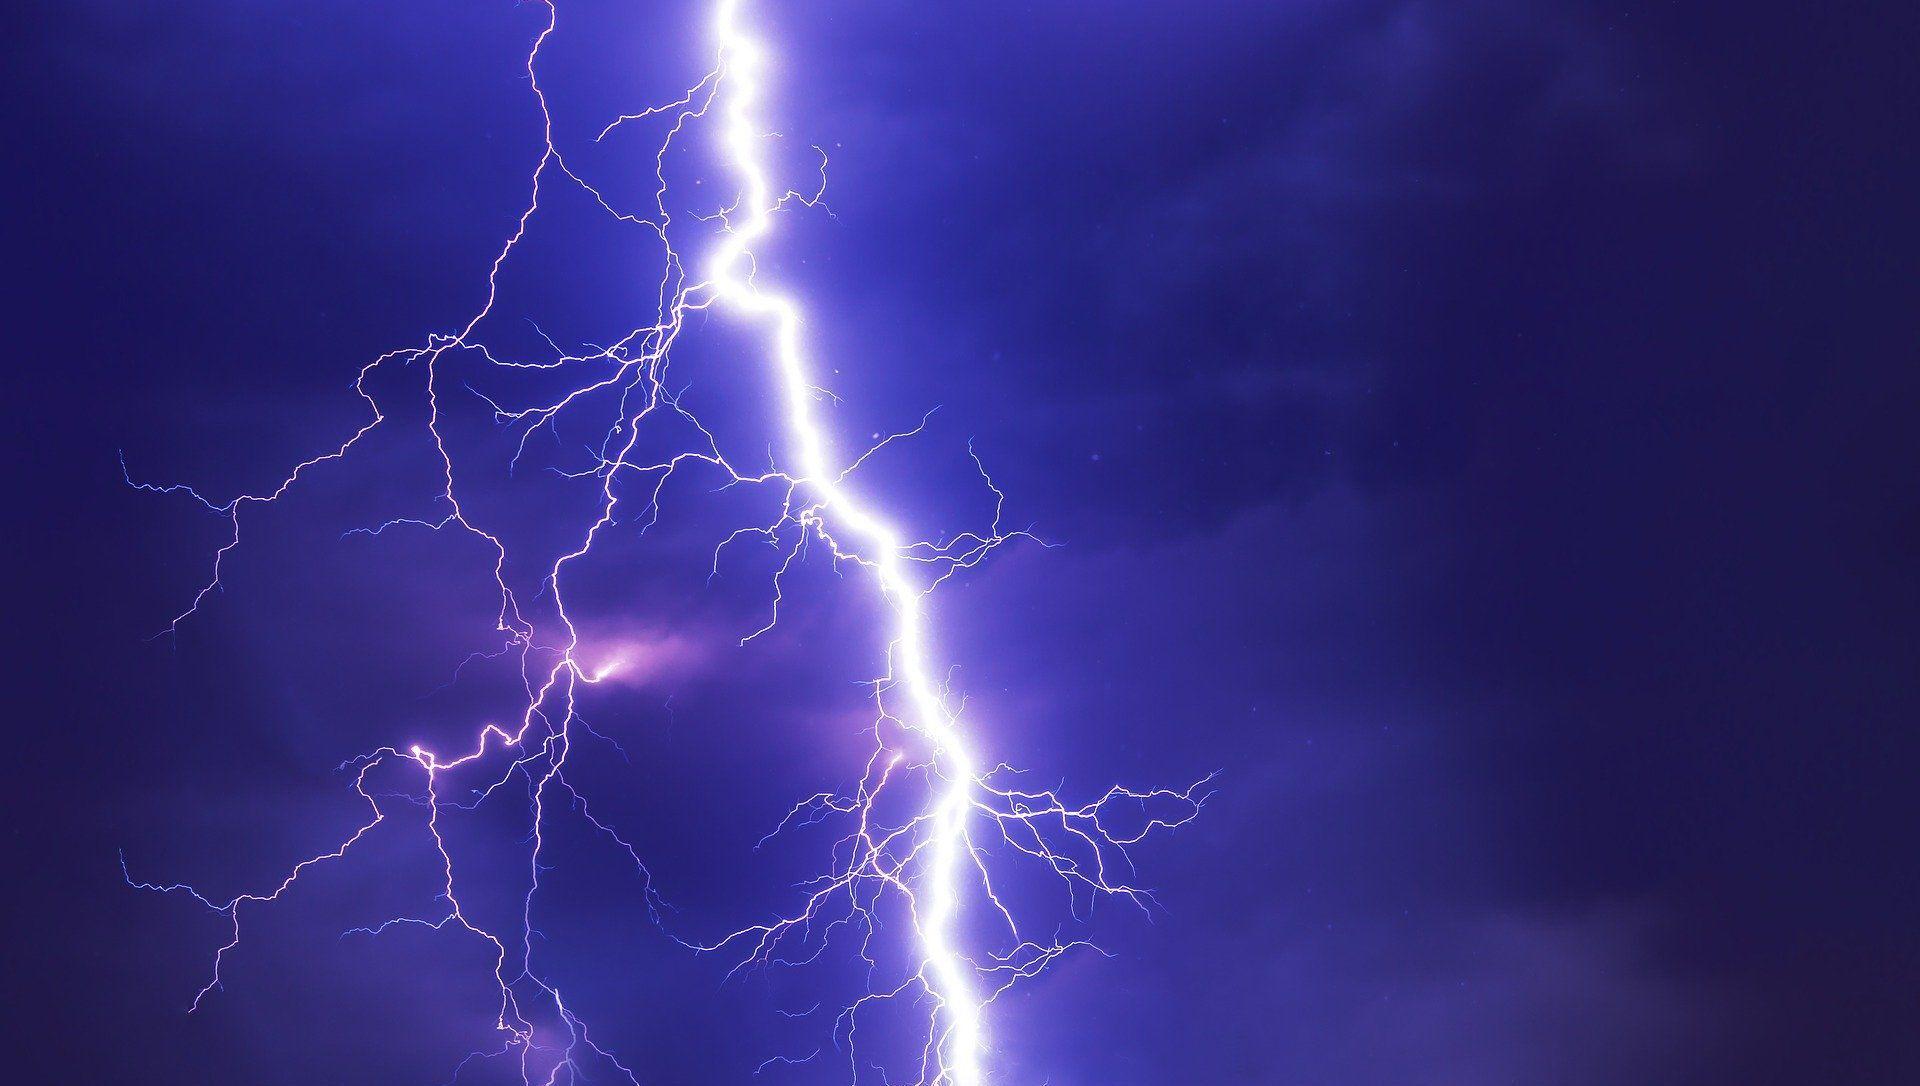 Lightning strike kills over 100 in India's Uttar Pradesh and Bihar  - Sputnik International, 1920, 08.06.2021